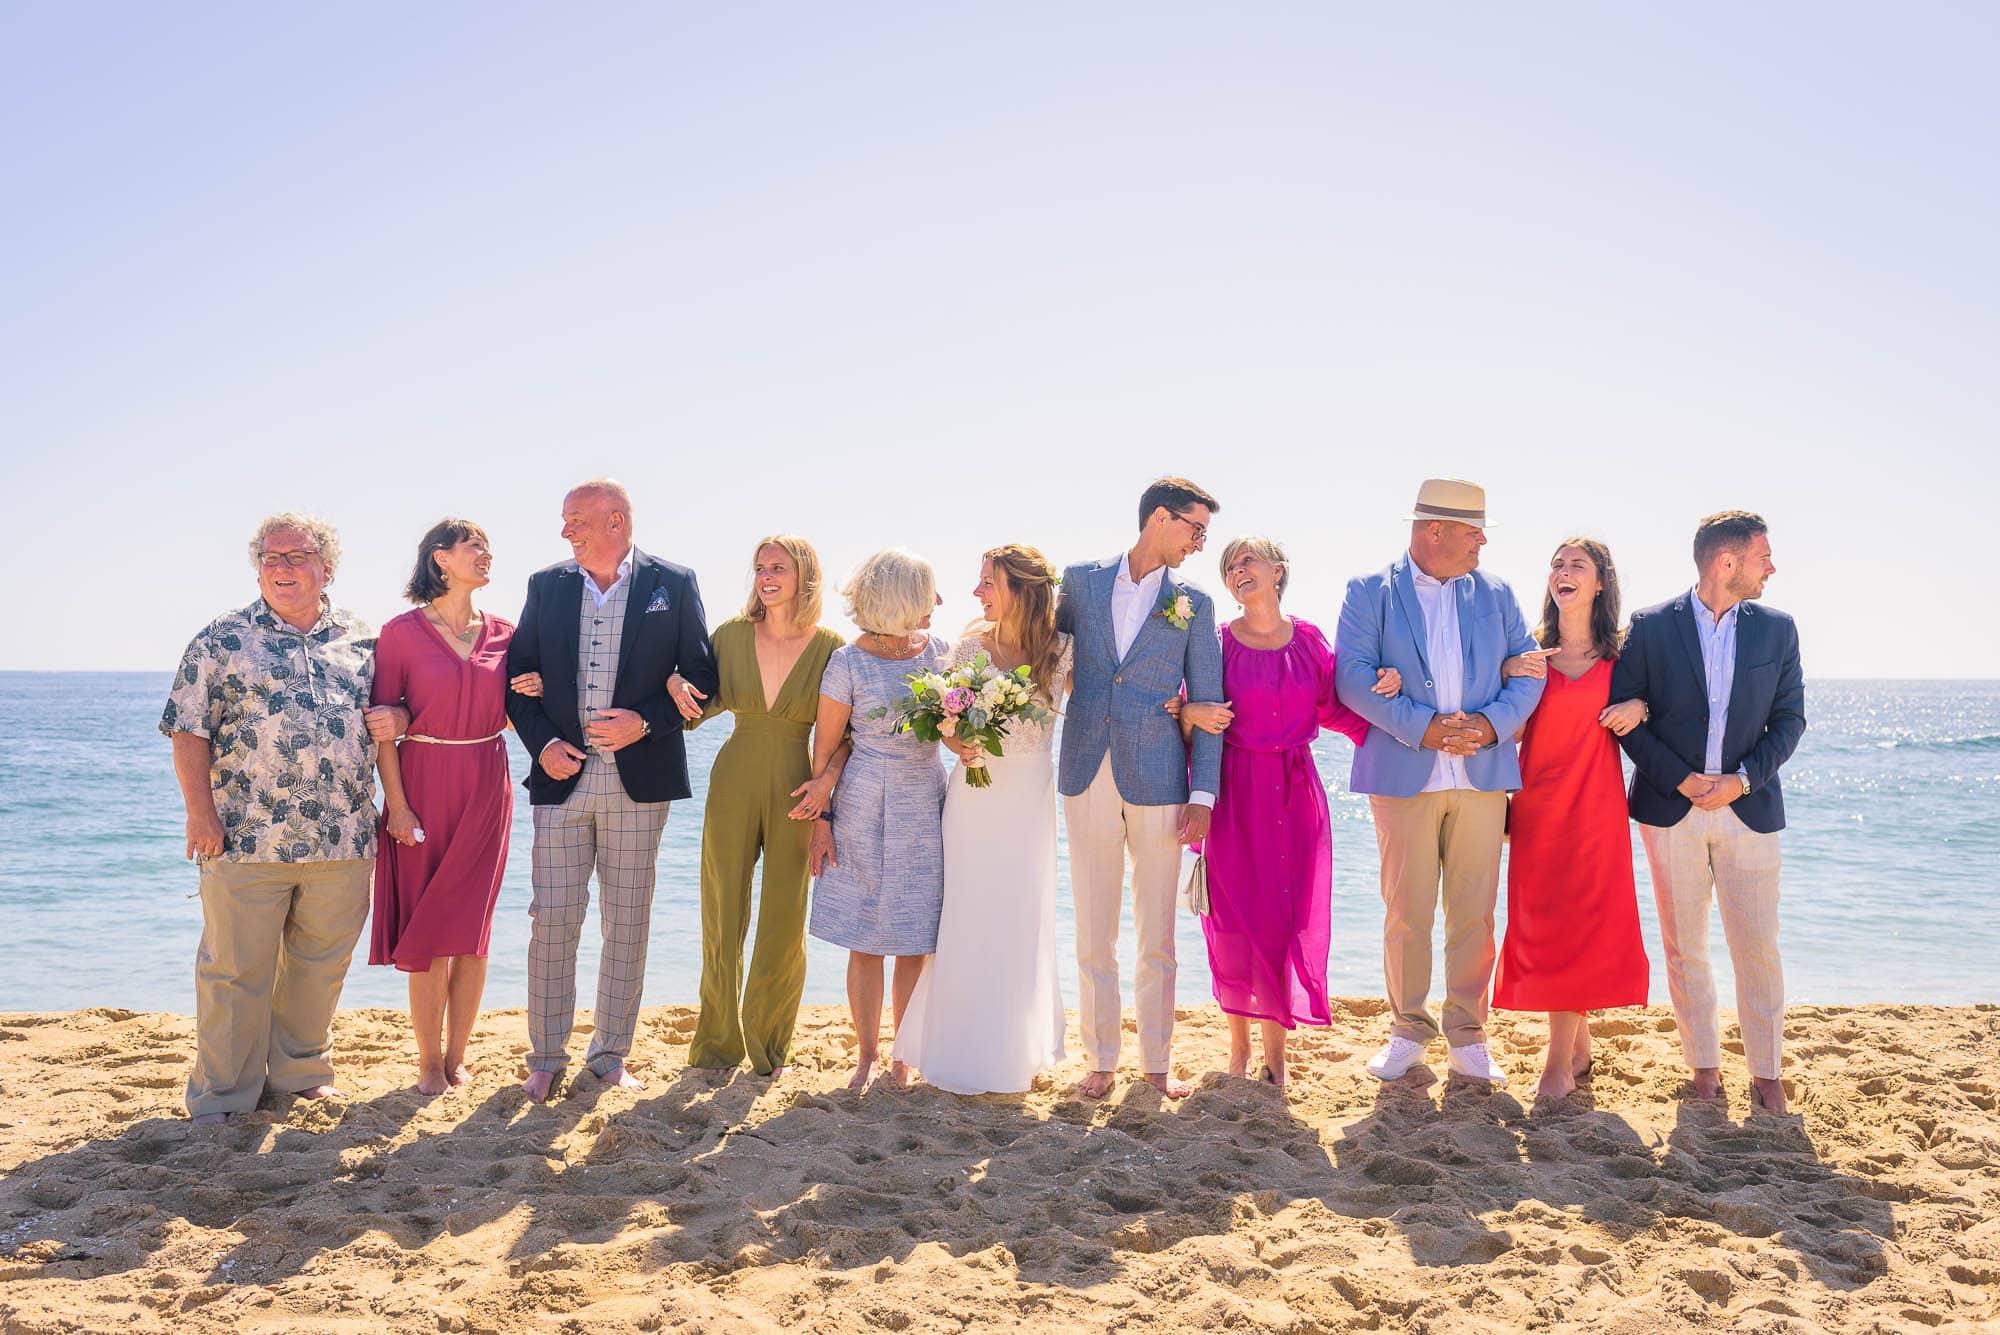 031_Alan_and_Heidi_Wedding_Verena_Andreas